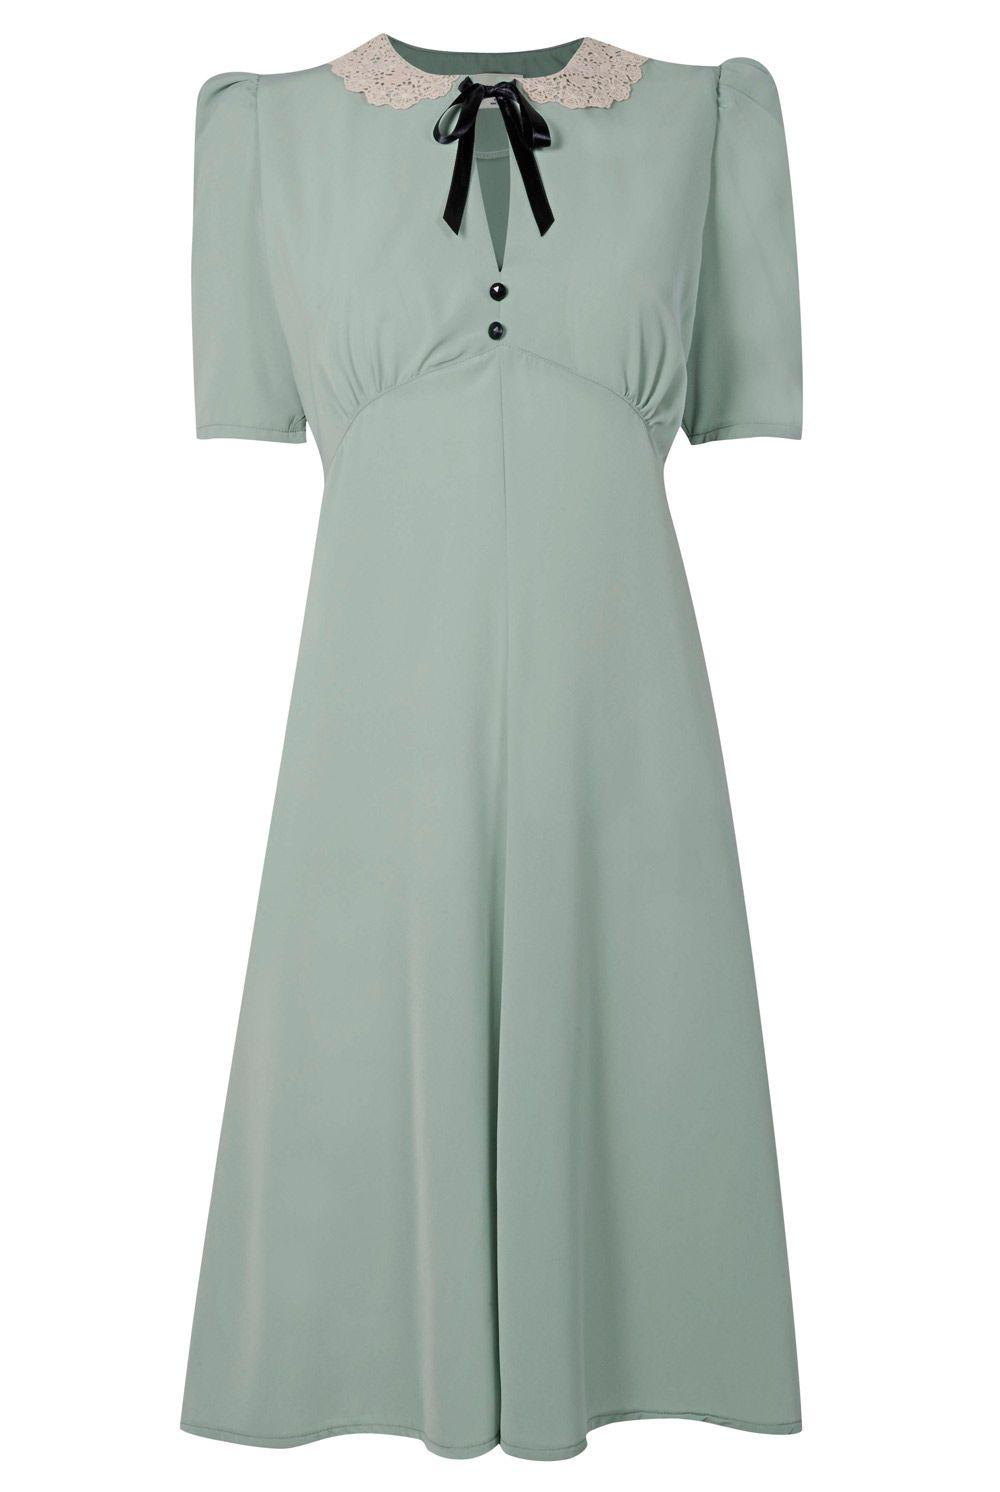 Tara Starlet 1940s 40s Style: Fashion, 1940s Fashion